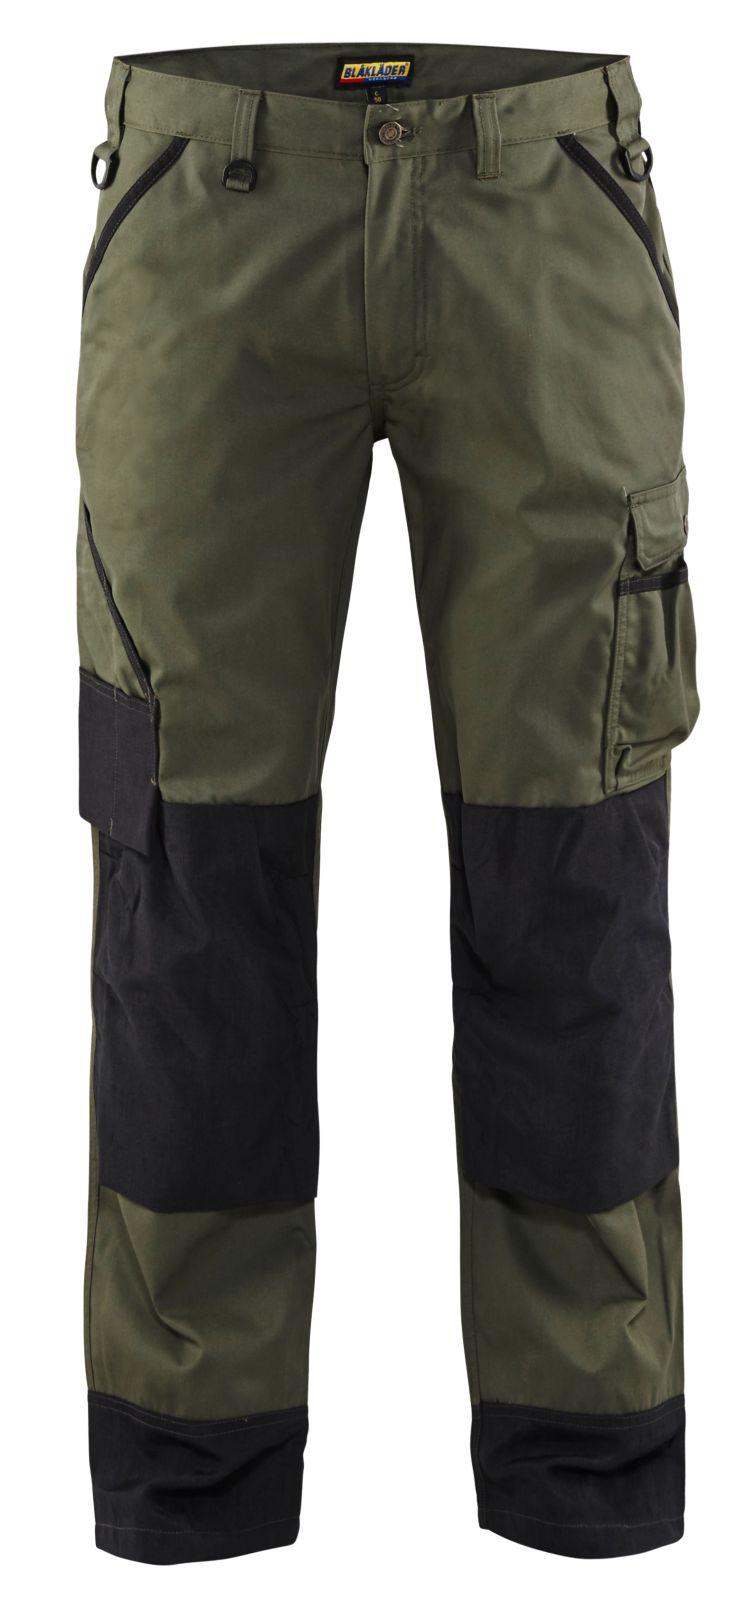 Blaklader Broeken 14541835 army groen-zwart(4699)